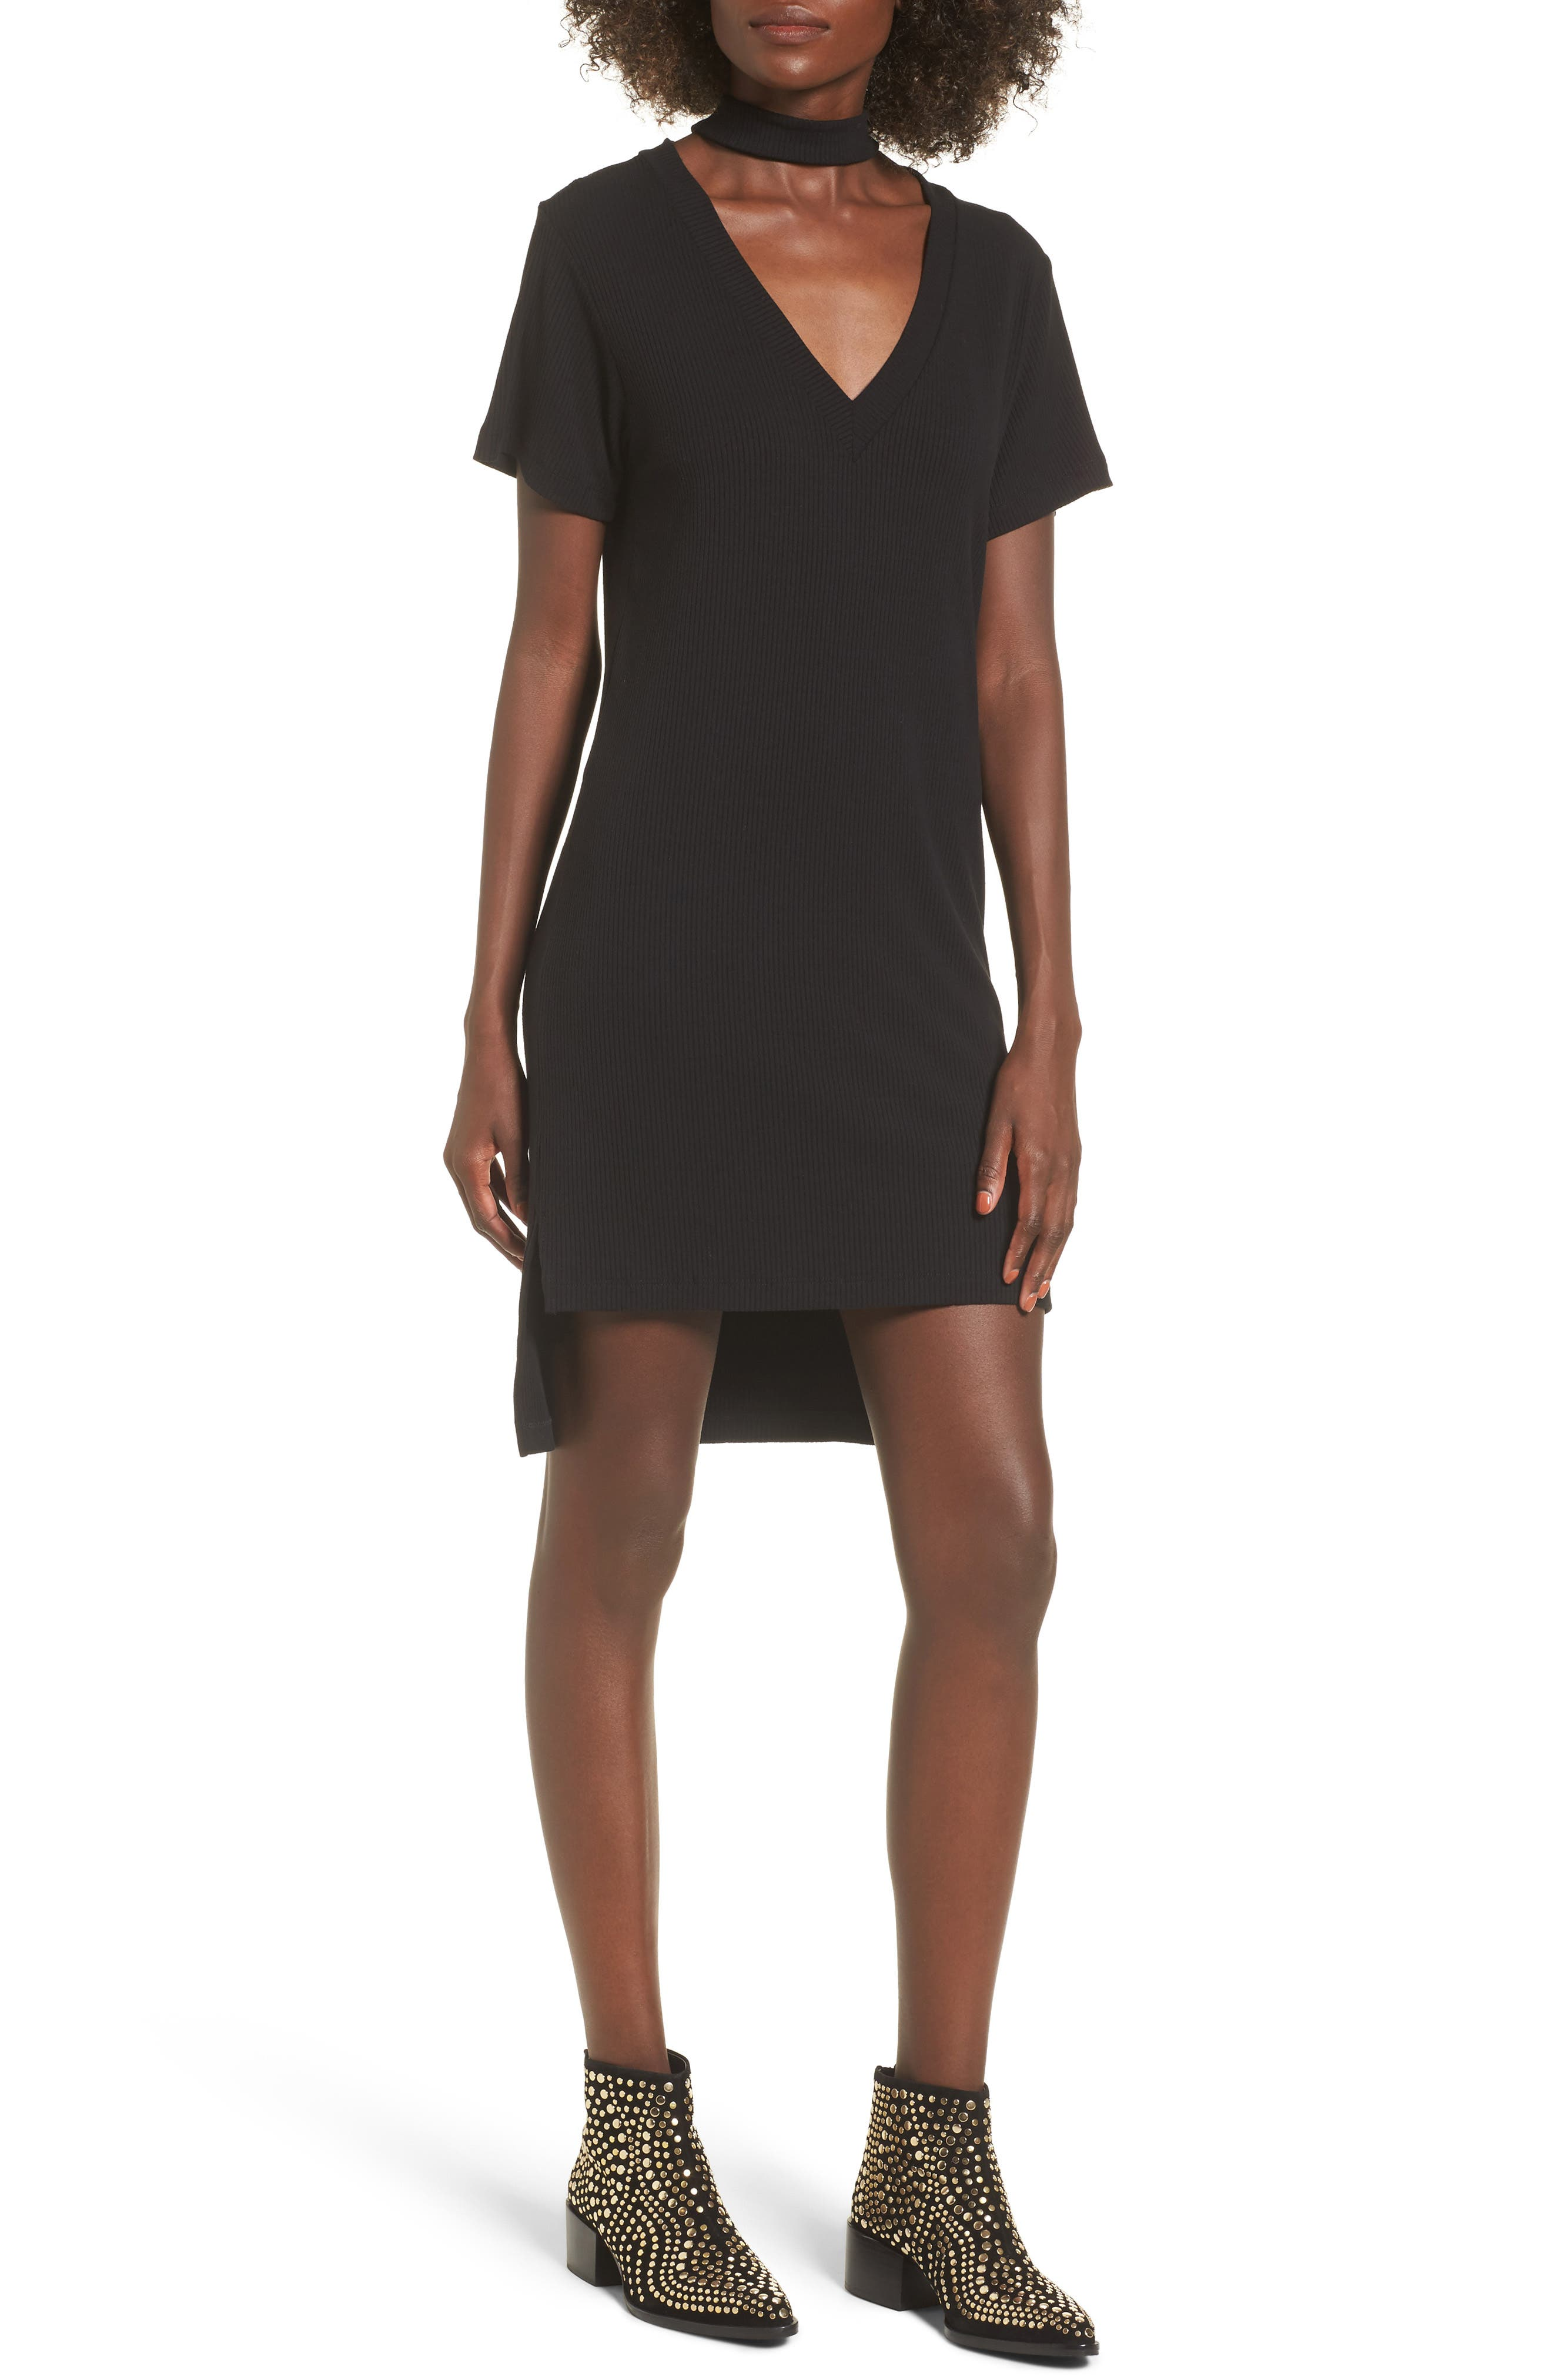 Main Image - LNA Klassen Choker Dress